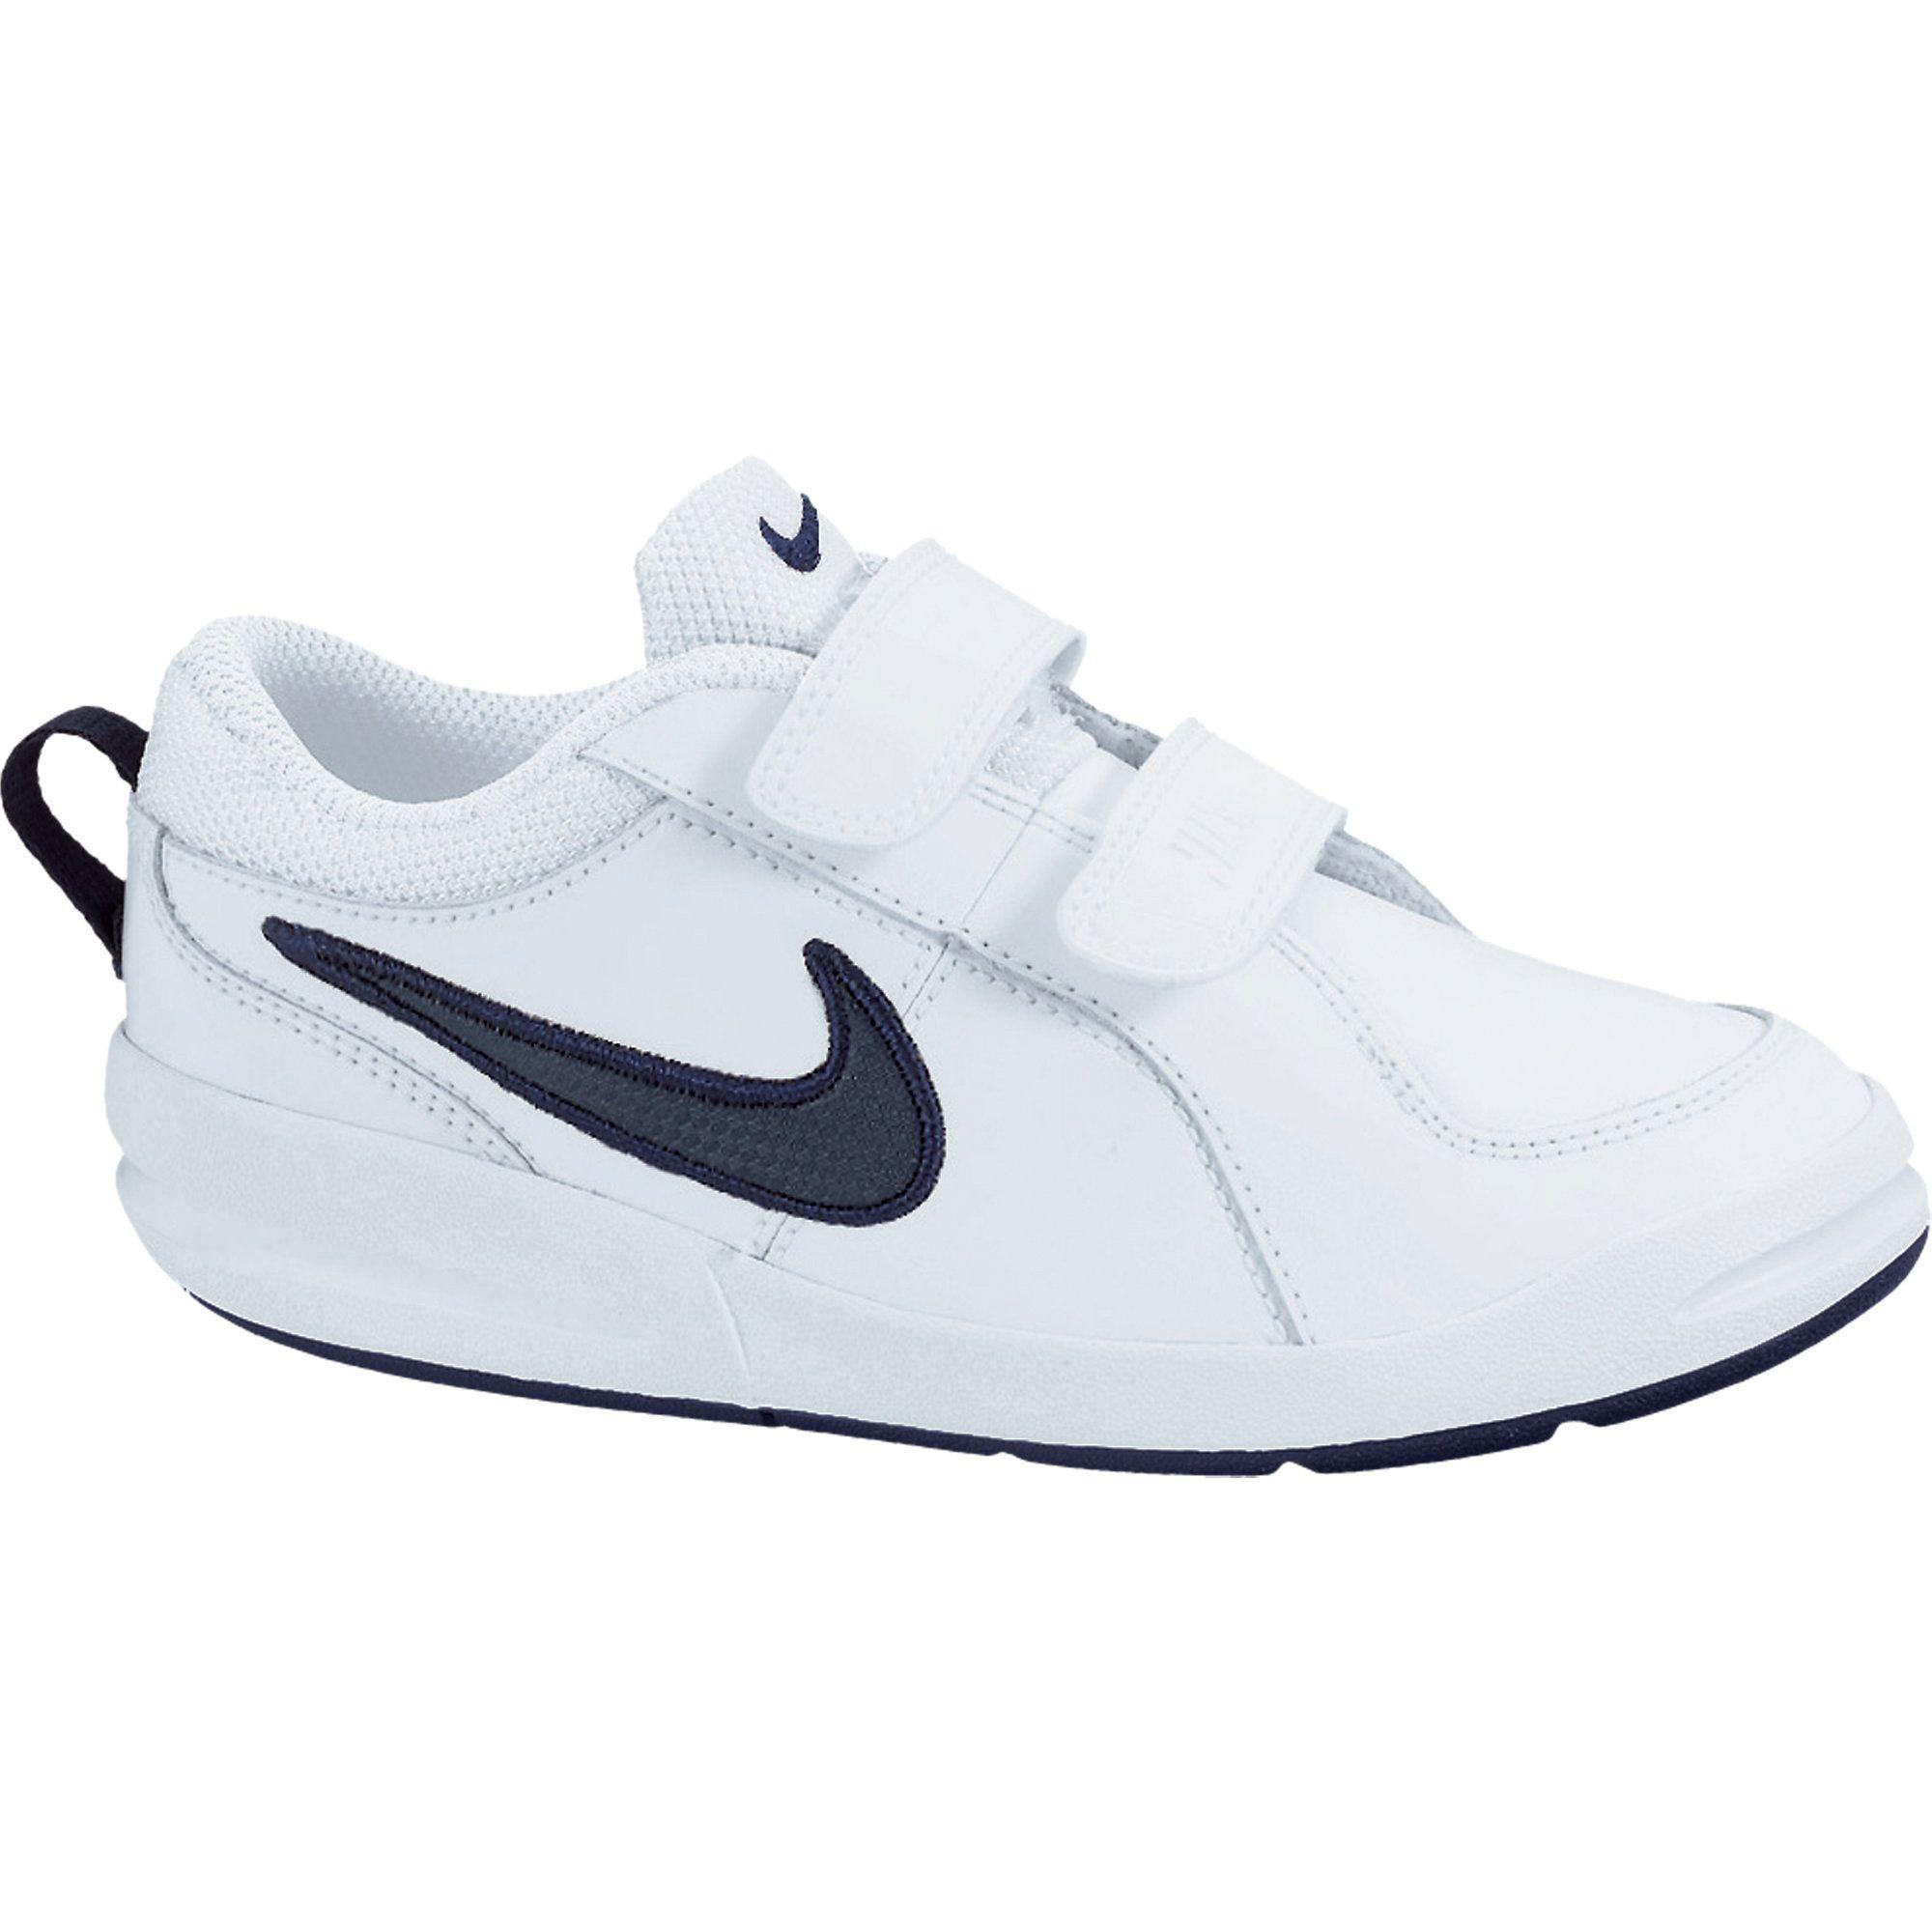 zapatillas nike niño velcro, Nike mujer calzado tennis